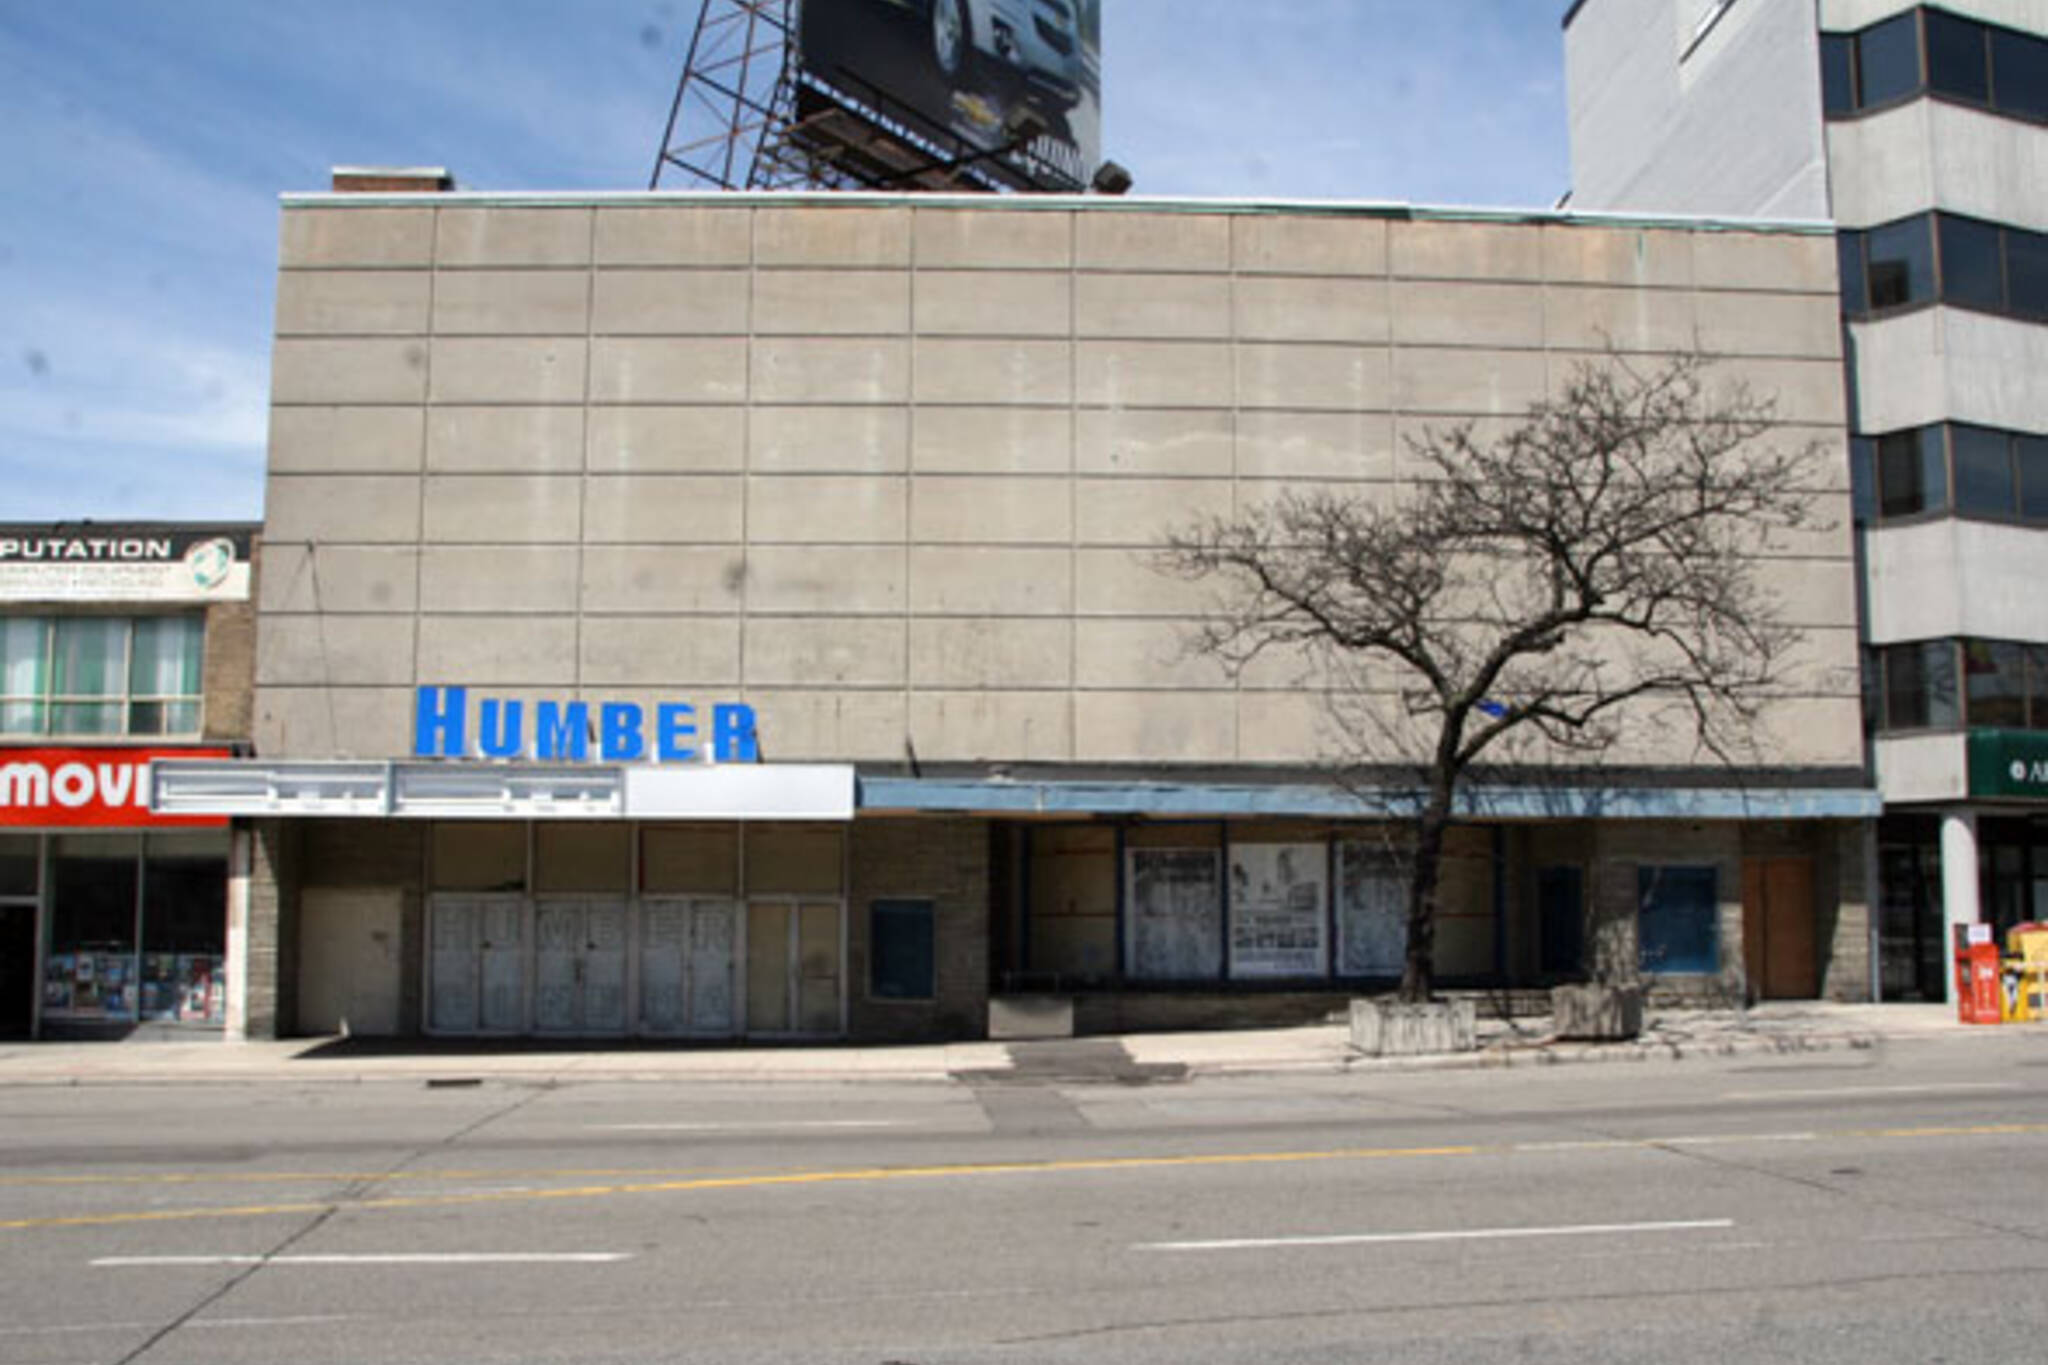 humber cinema closed bloor street